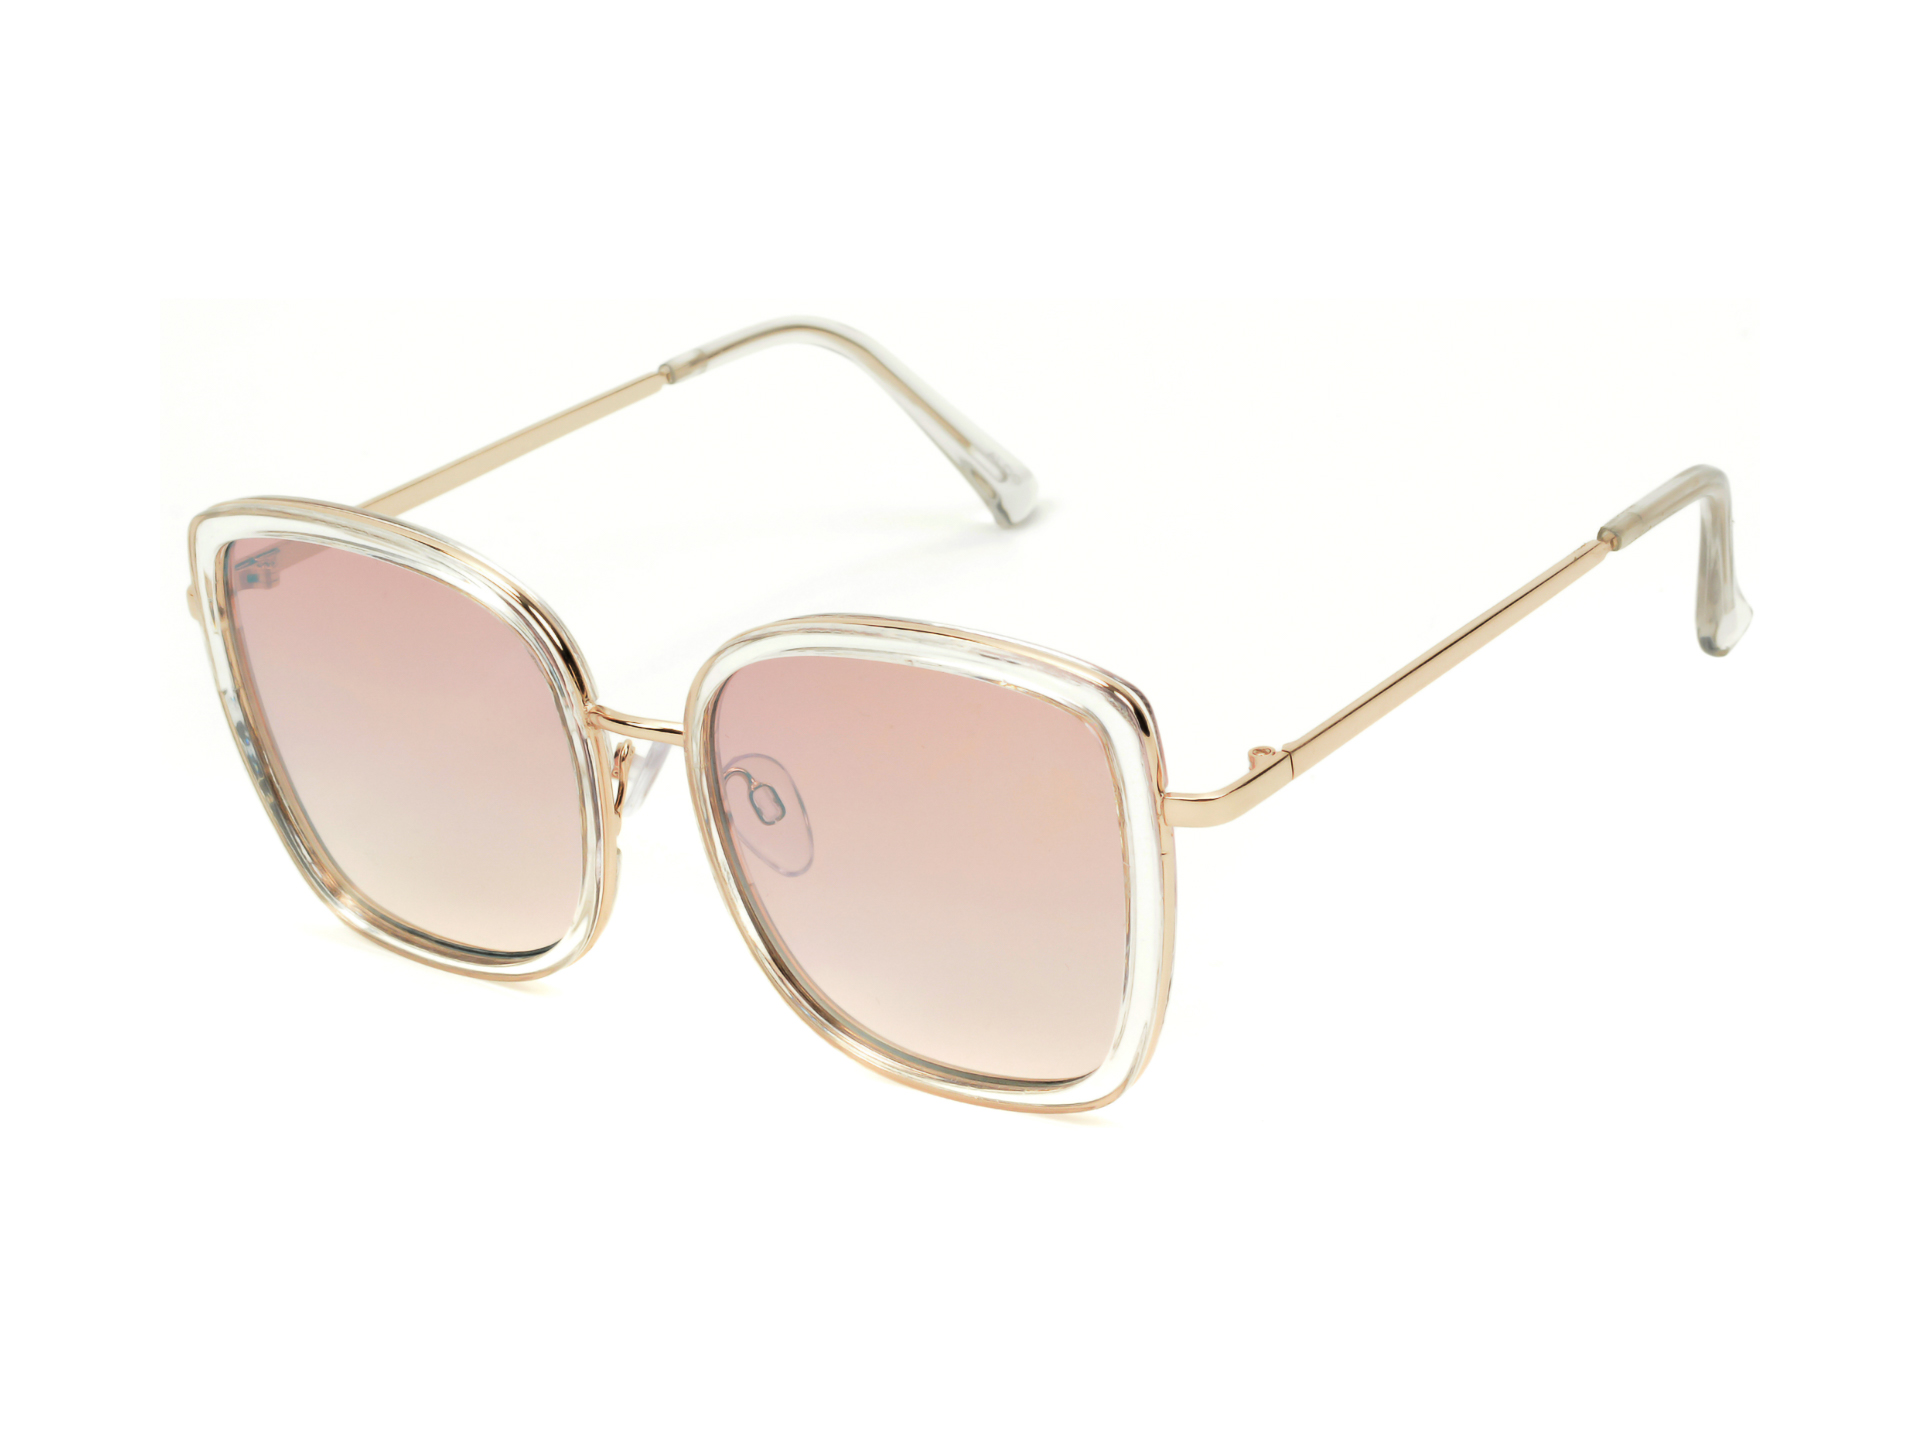 Ochelari de soare ALDO metalic, Aaonia972, din PVC imagine